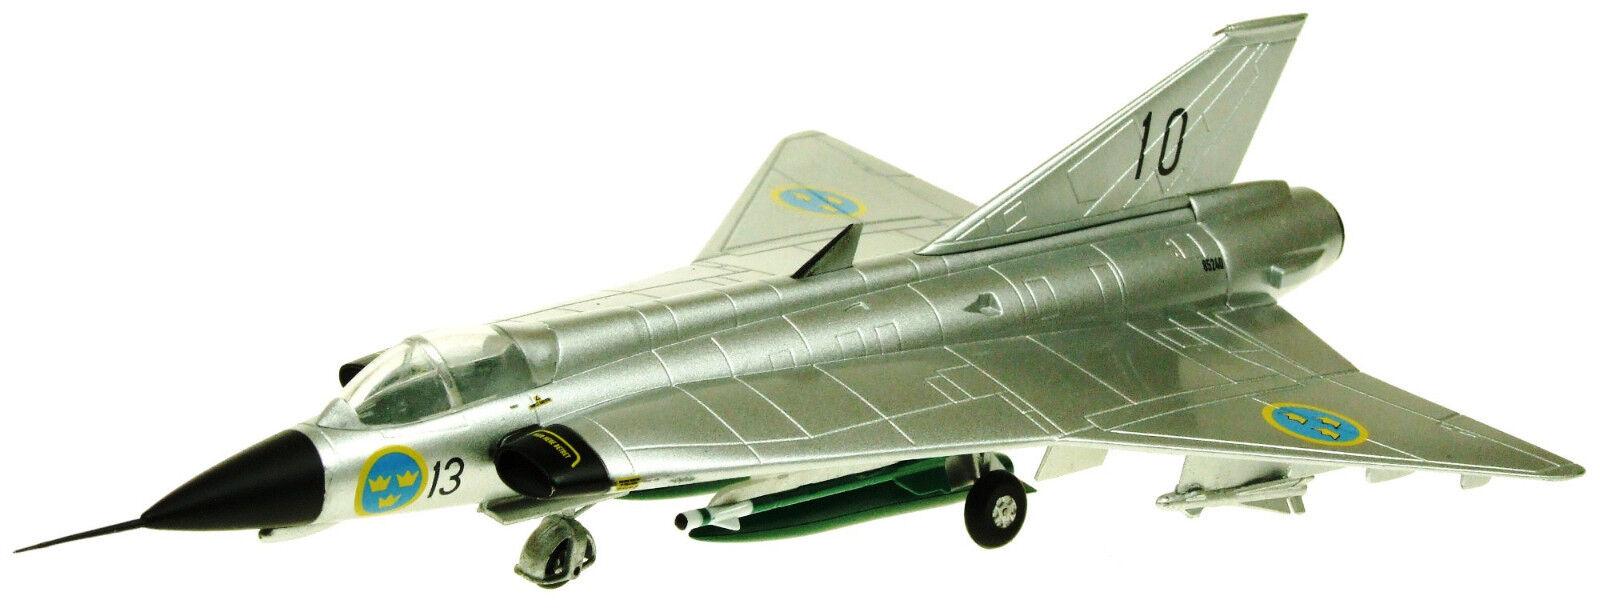 AV7241004 1 72 SAAB DRAKEN J35 13-10 SWEDISH AIR AIR AIR FORCE ALL METAL LIVERY W STAND f6ece6